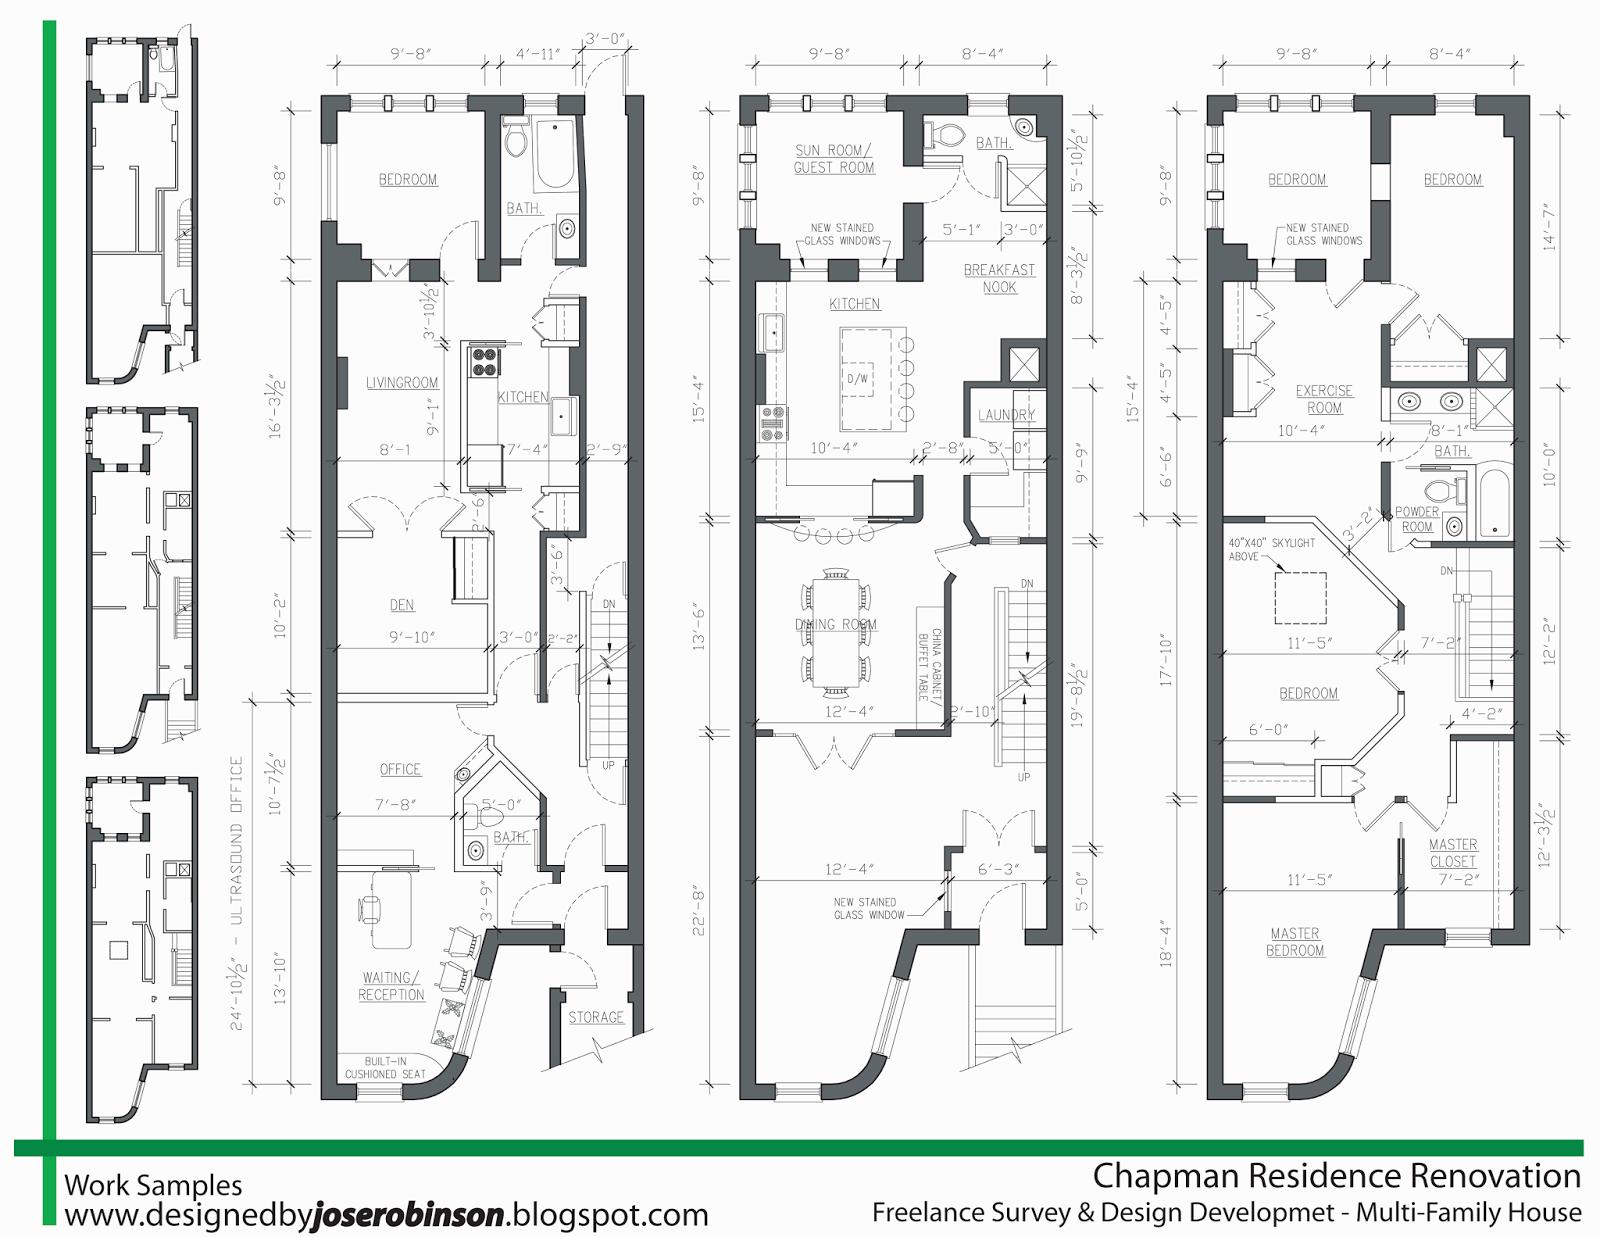 Designed By Jose Robinson : Design Development Samples